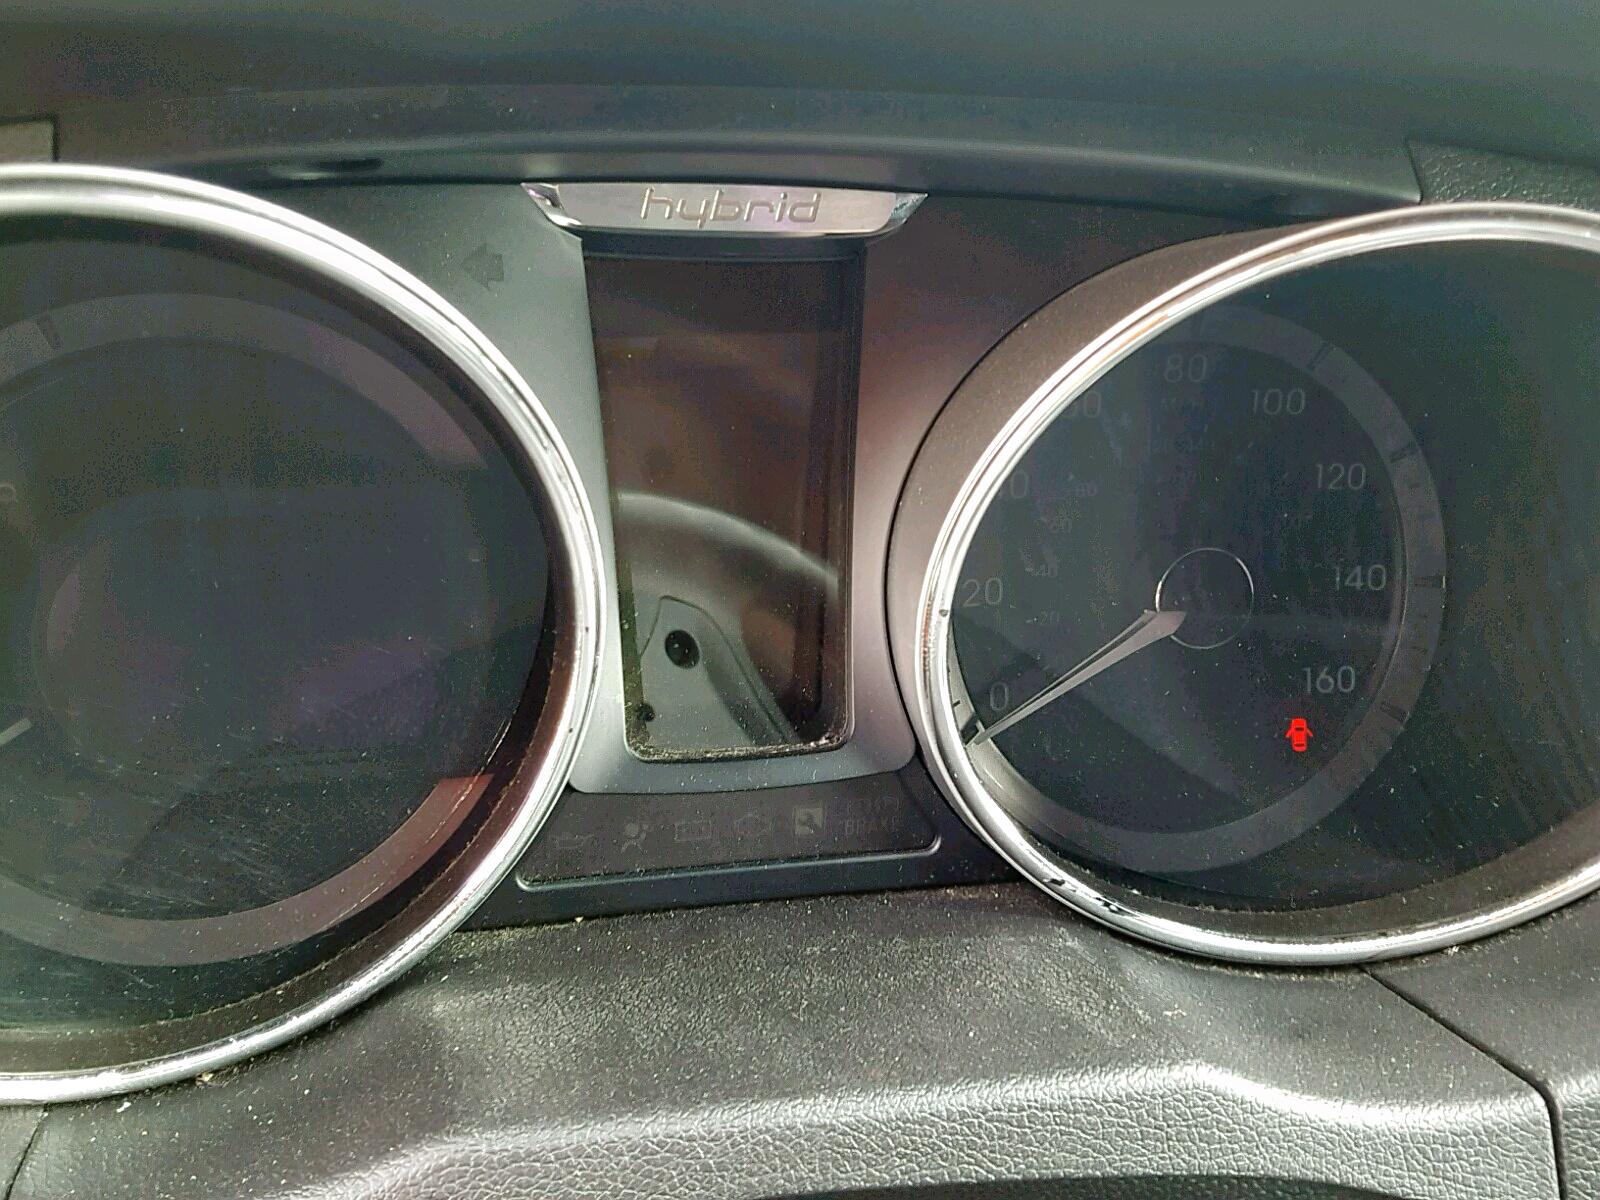 2012 Hyundai Sonata Hyb 2.4L front view